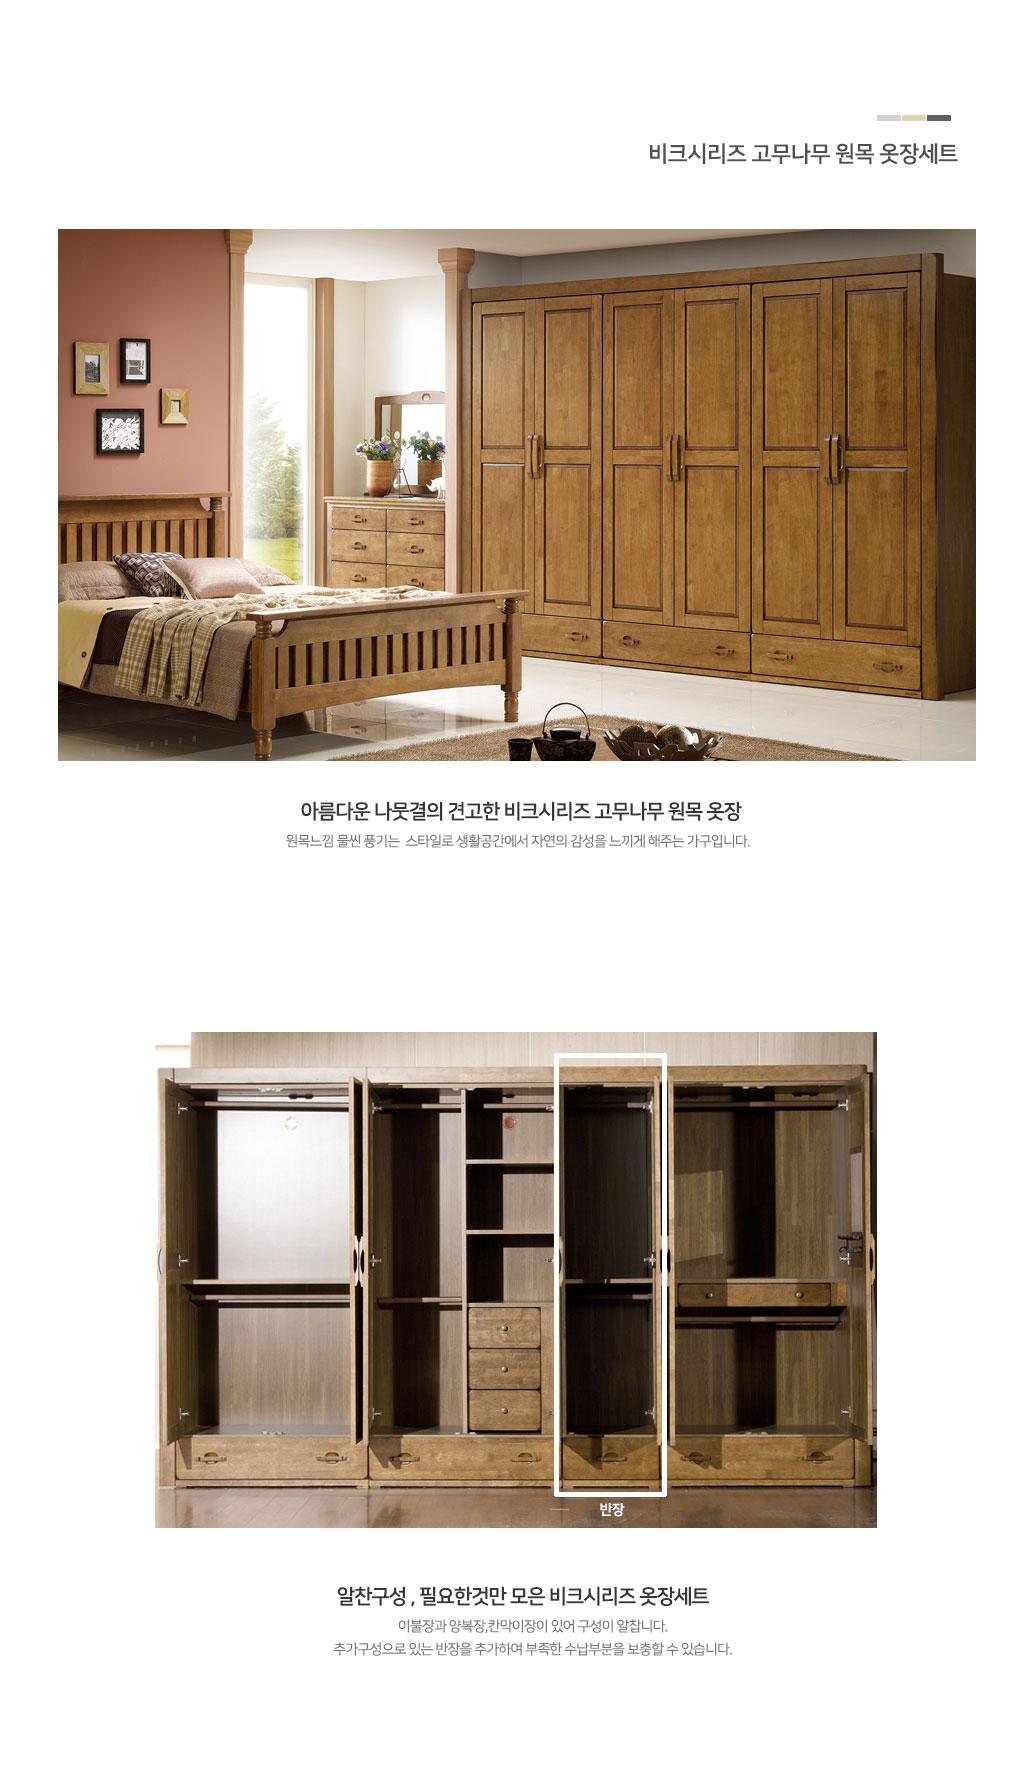 veek_closet_05.jpg